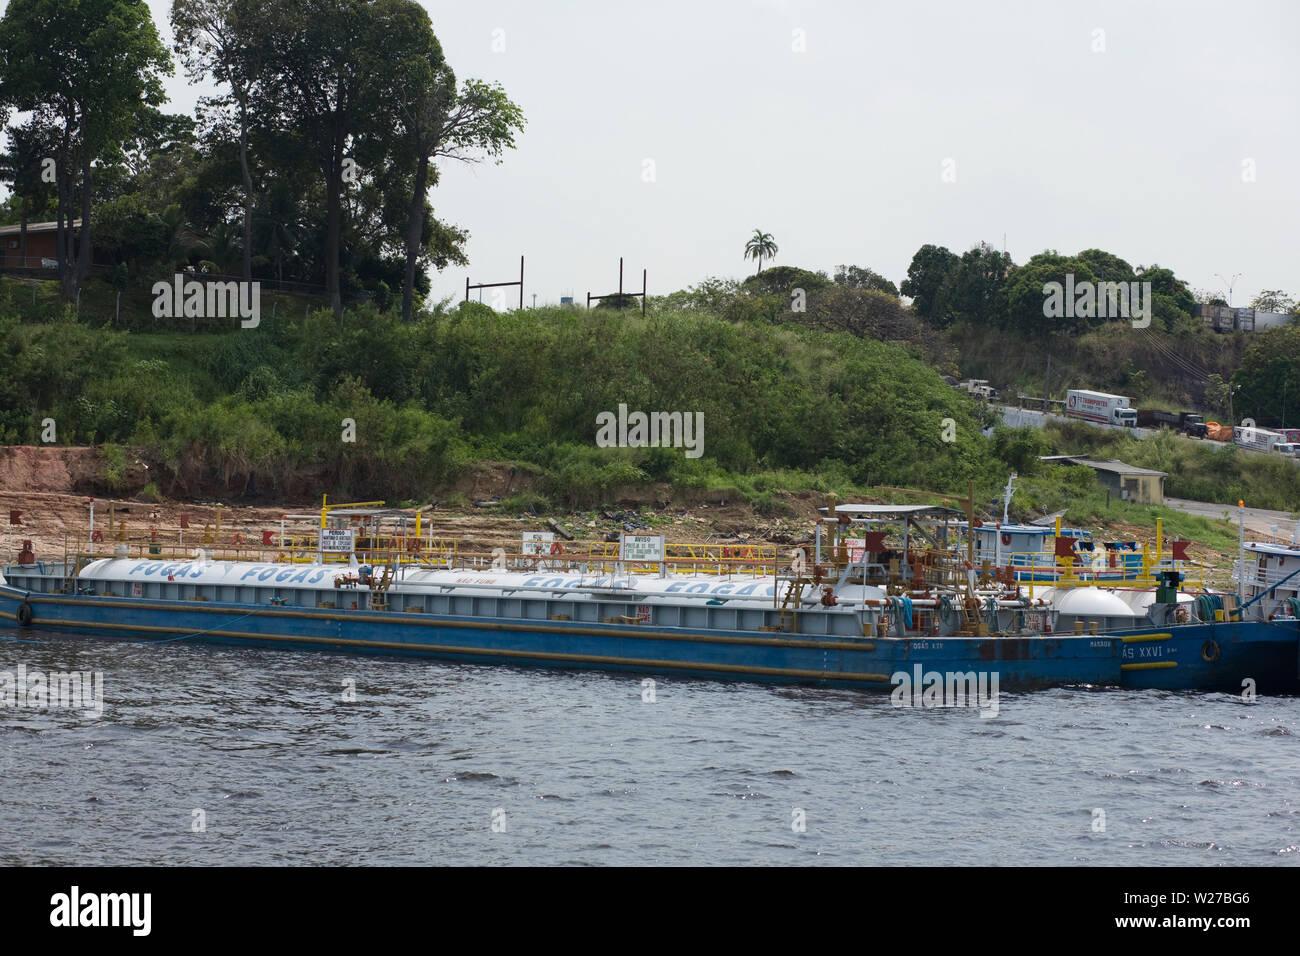 Embark and Disembarkation of Gas, Amazônia, Manaus, Amazonas, Brazil - Stock Image